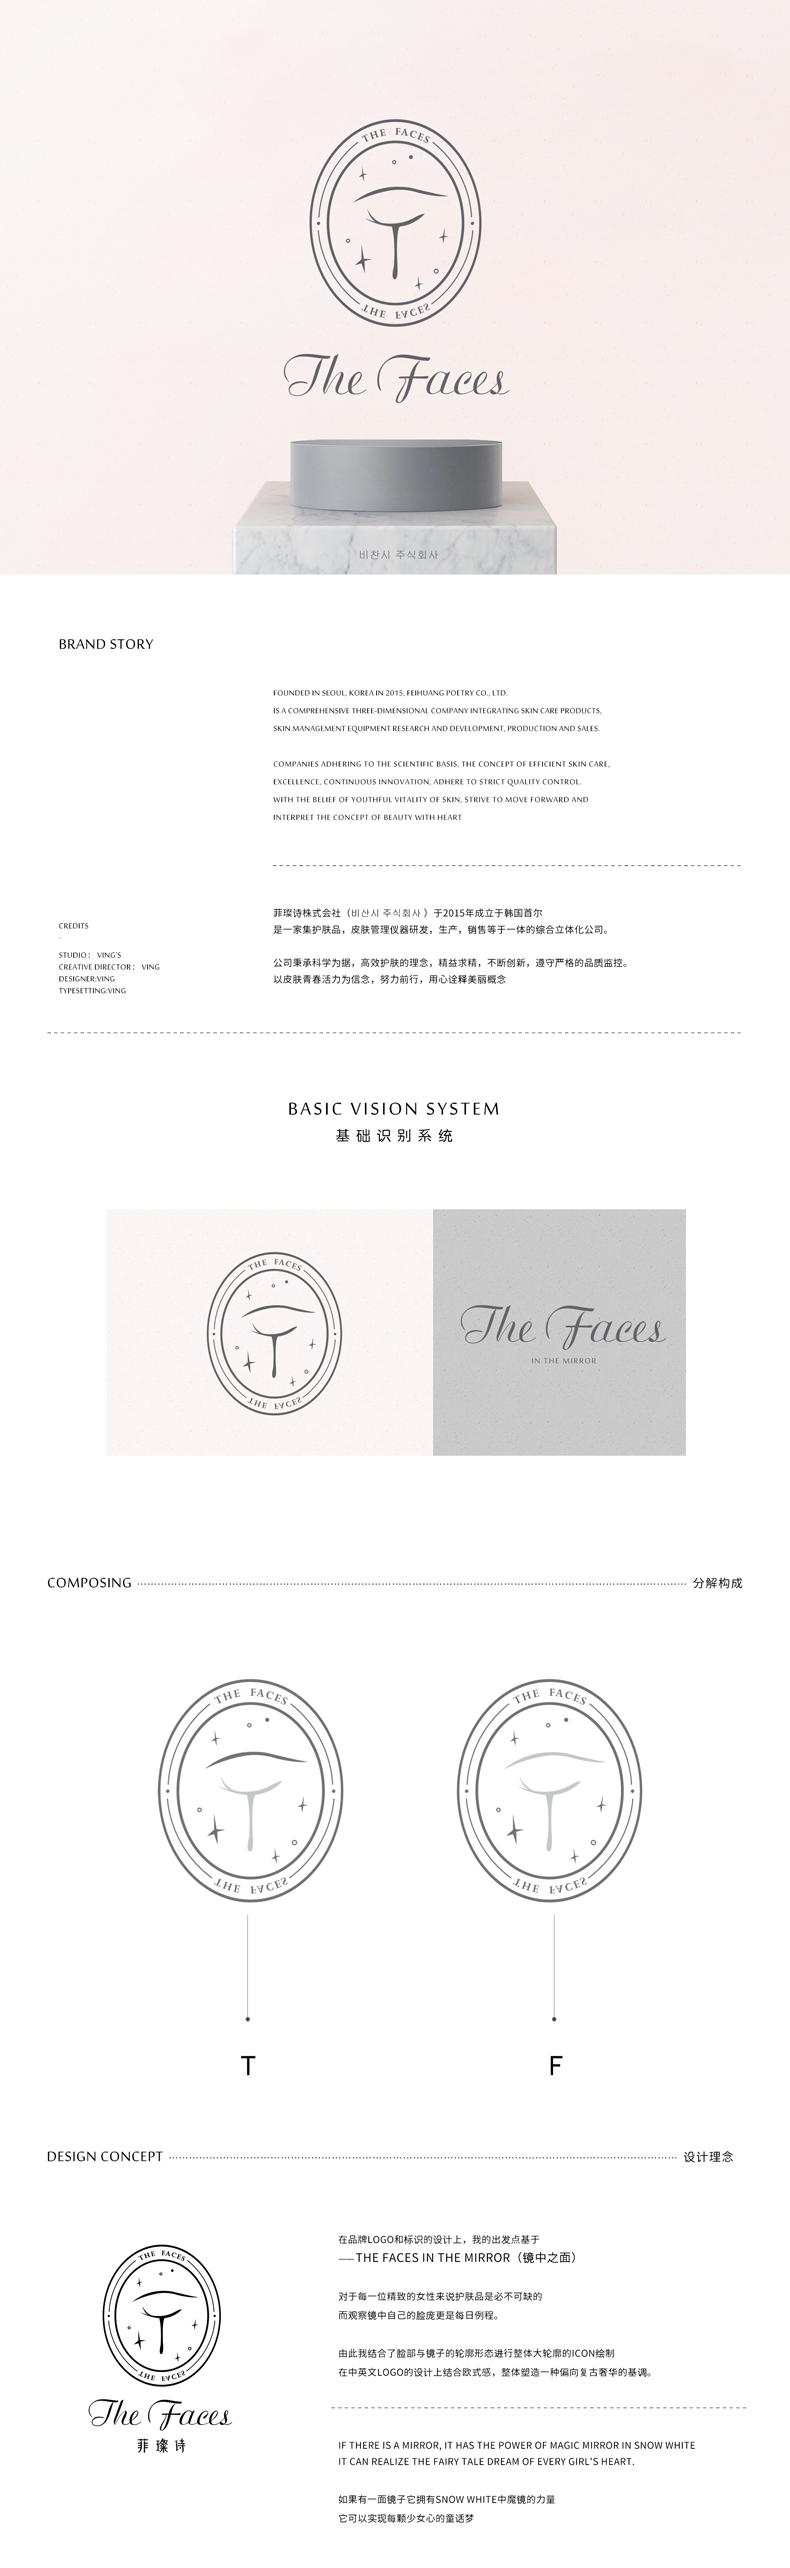 THE FACES品牌VI手册